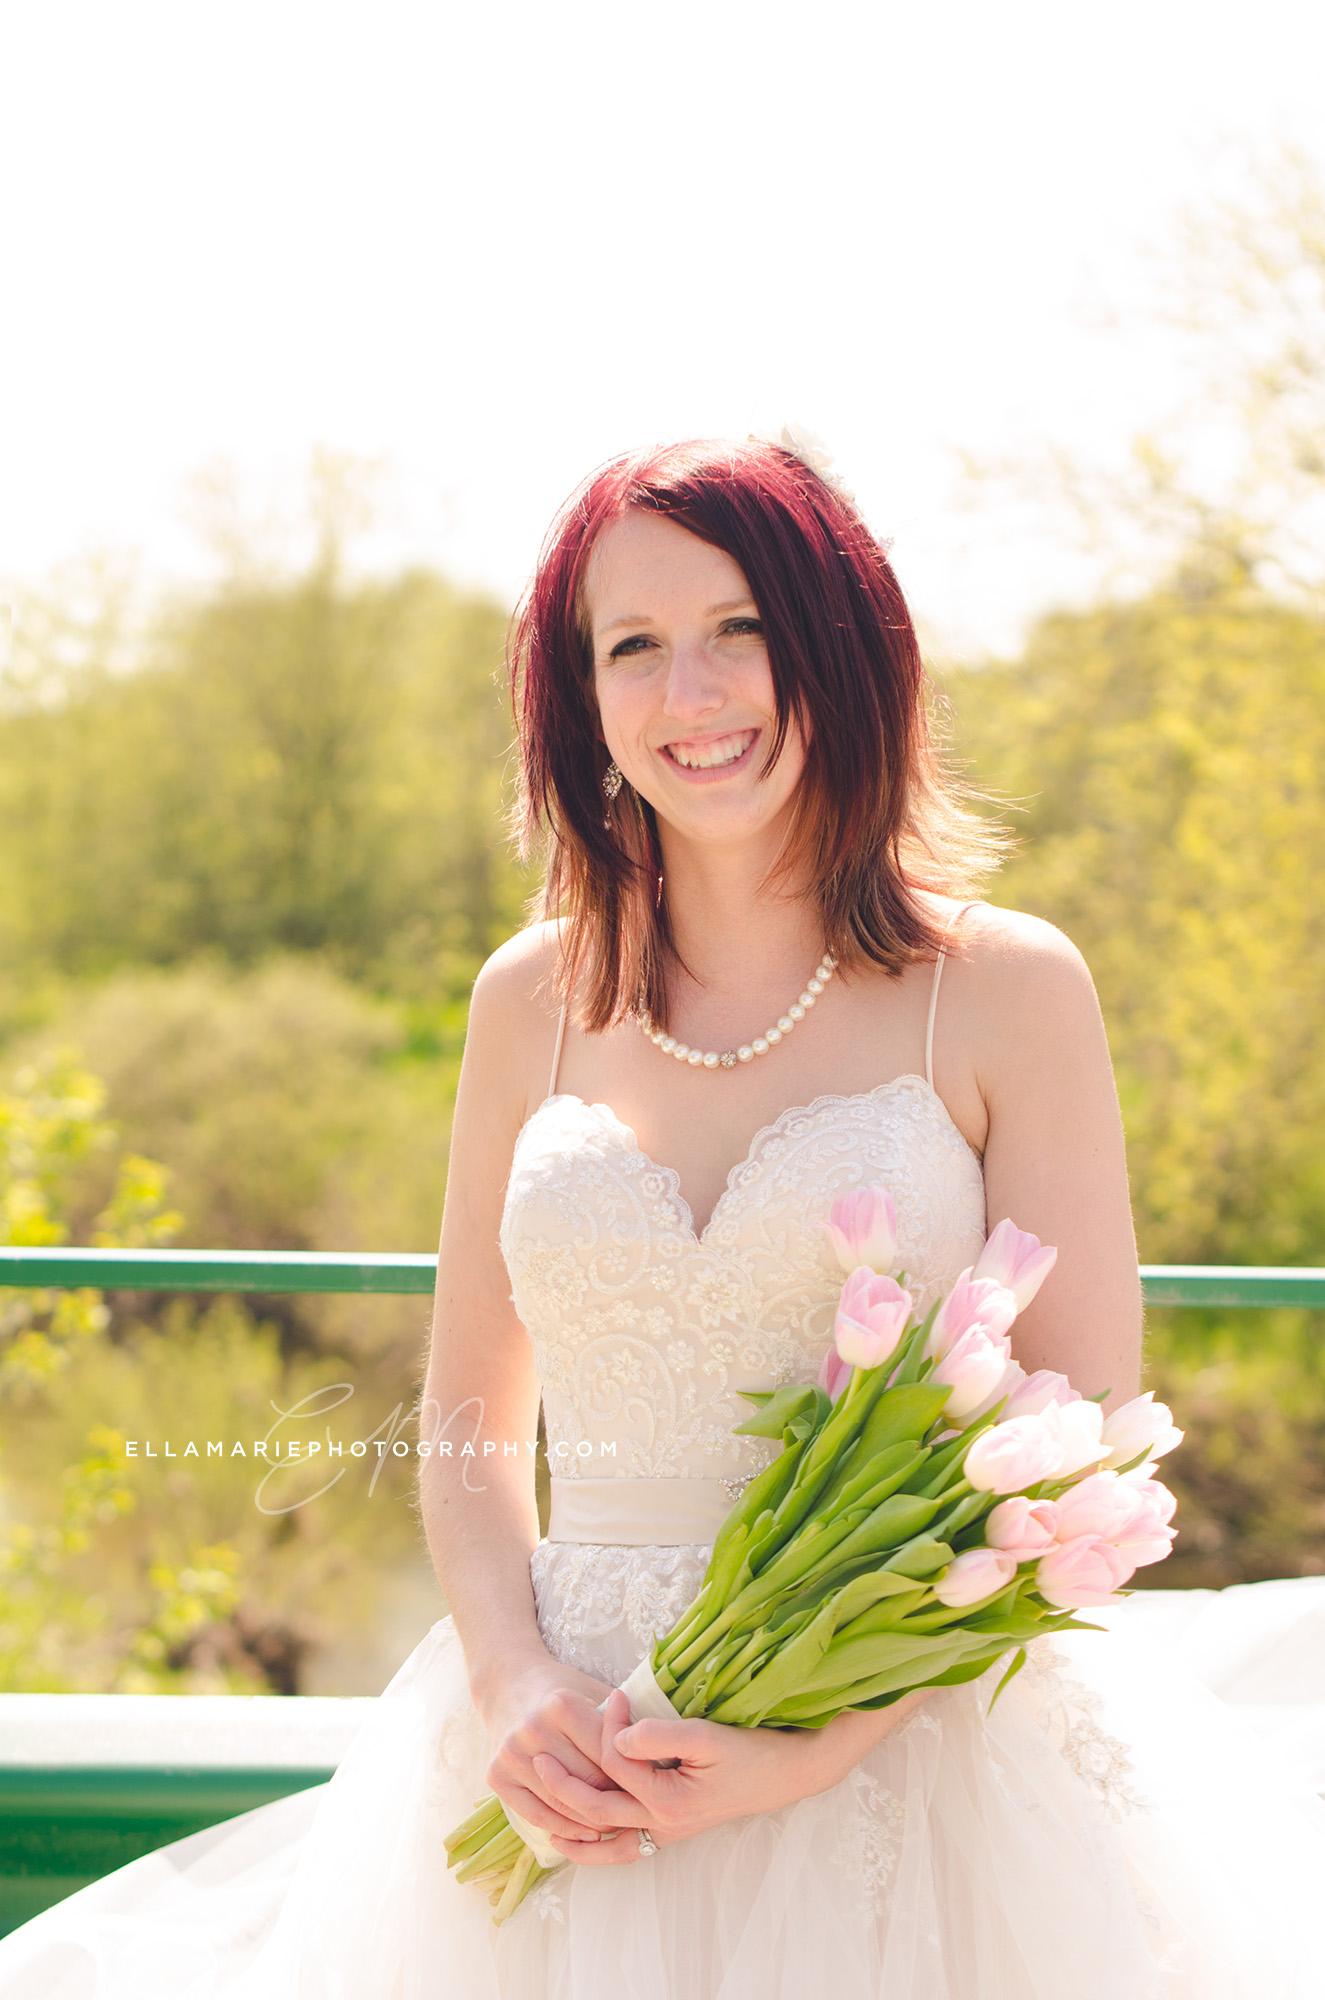 EllaMariePhotography_wedding_Baden_ON_New_Hamburg_Stratford_Waterloo_Kitchener_Guelph_Cambridge_Listowel_photographer_photography_02.jpg